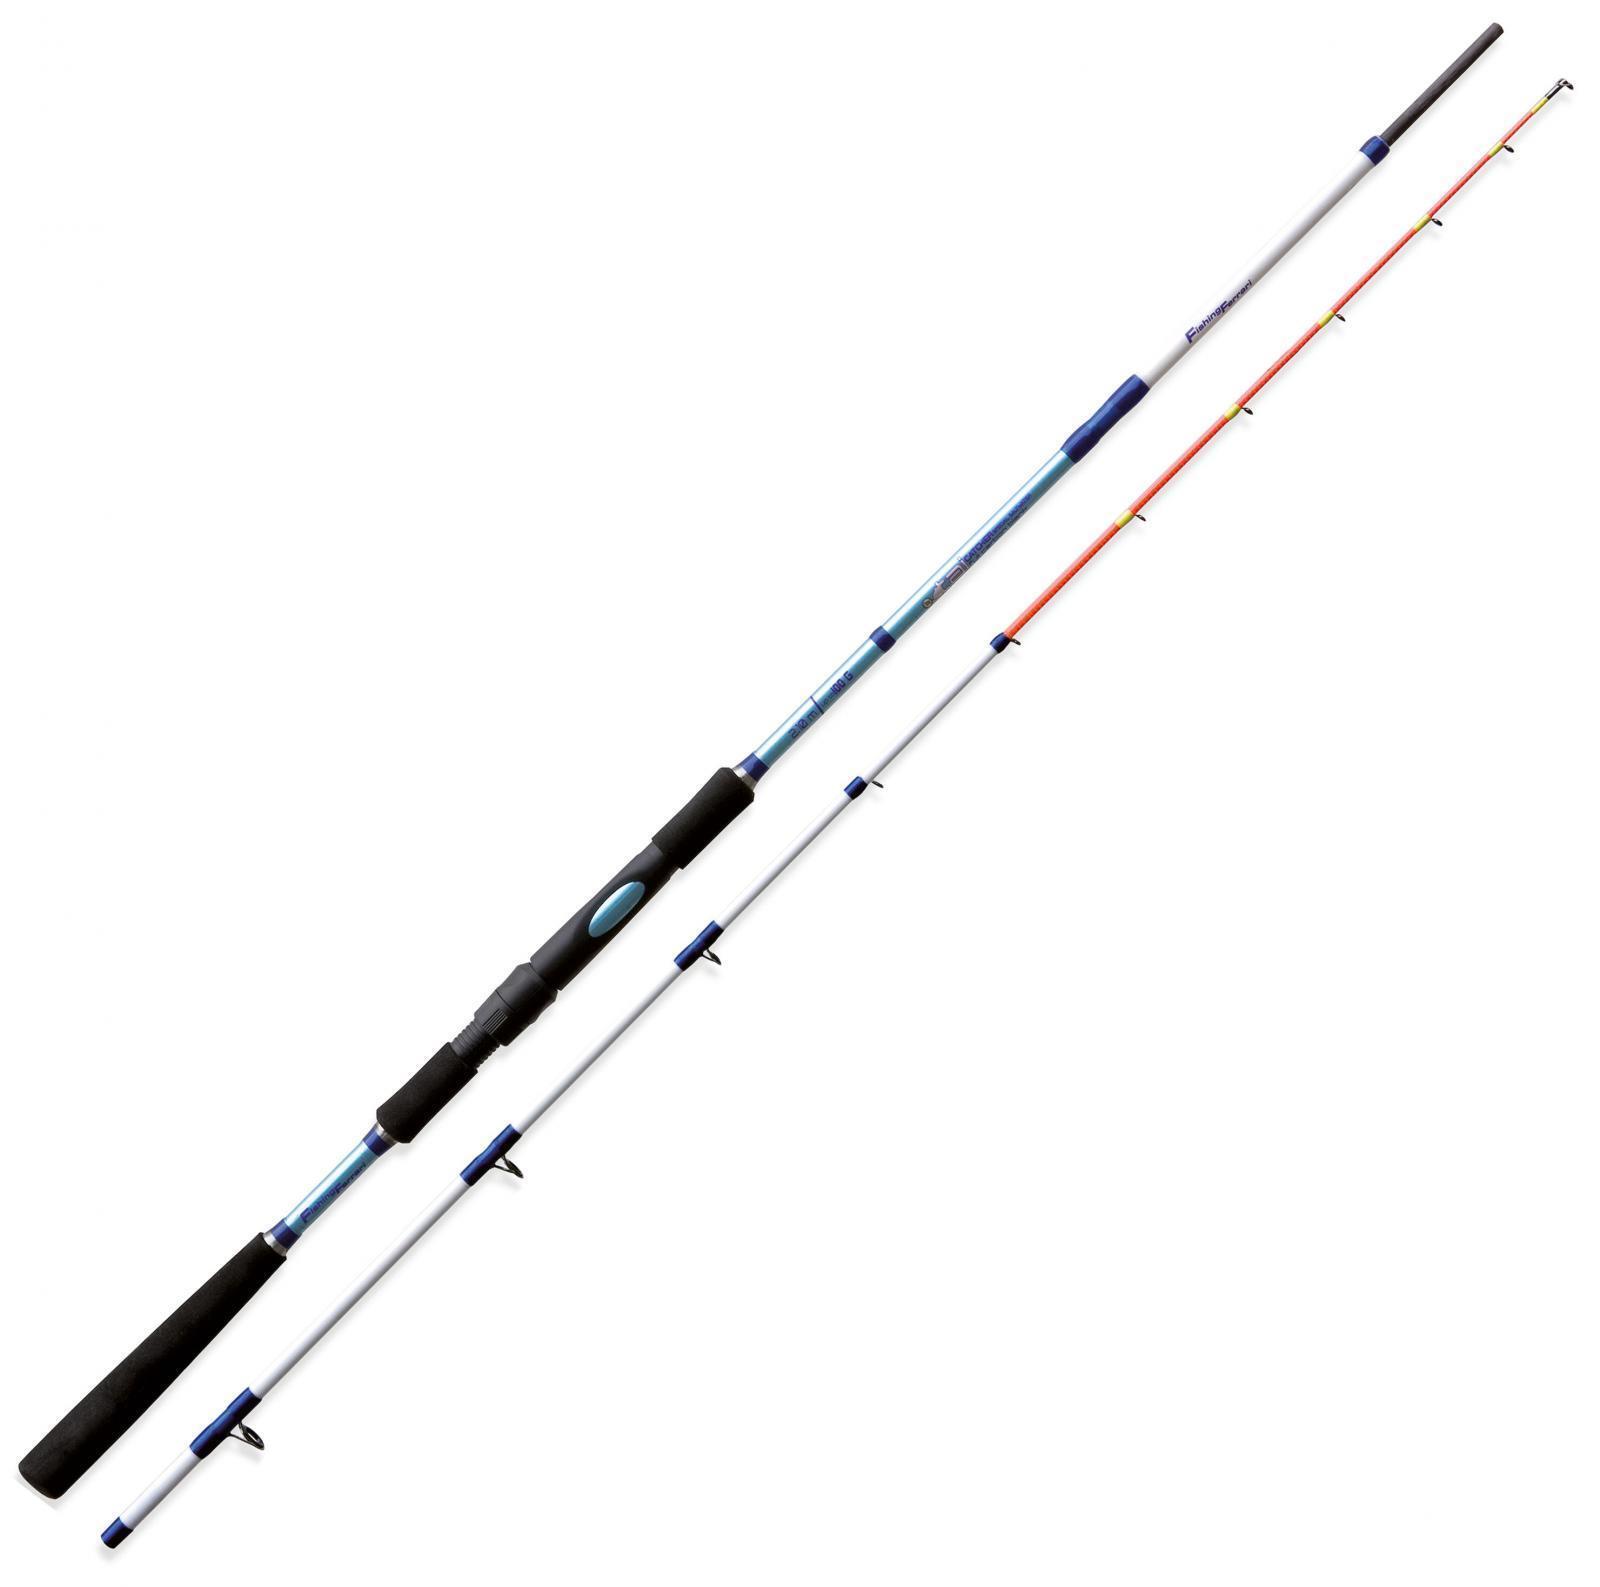 2241618 Canna Fishing Ferrari Tai Catcher 1,80 m 100 Gr Pesca Bolentino CAS